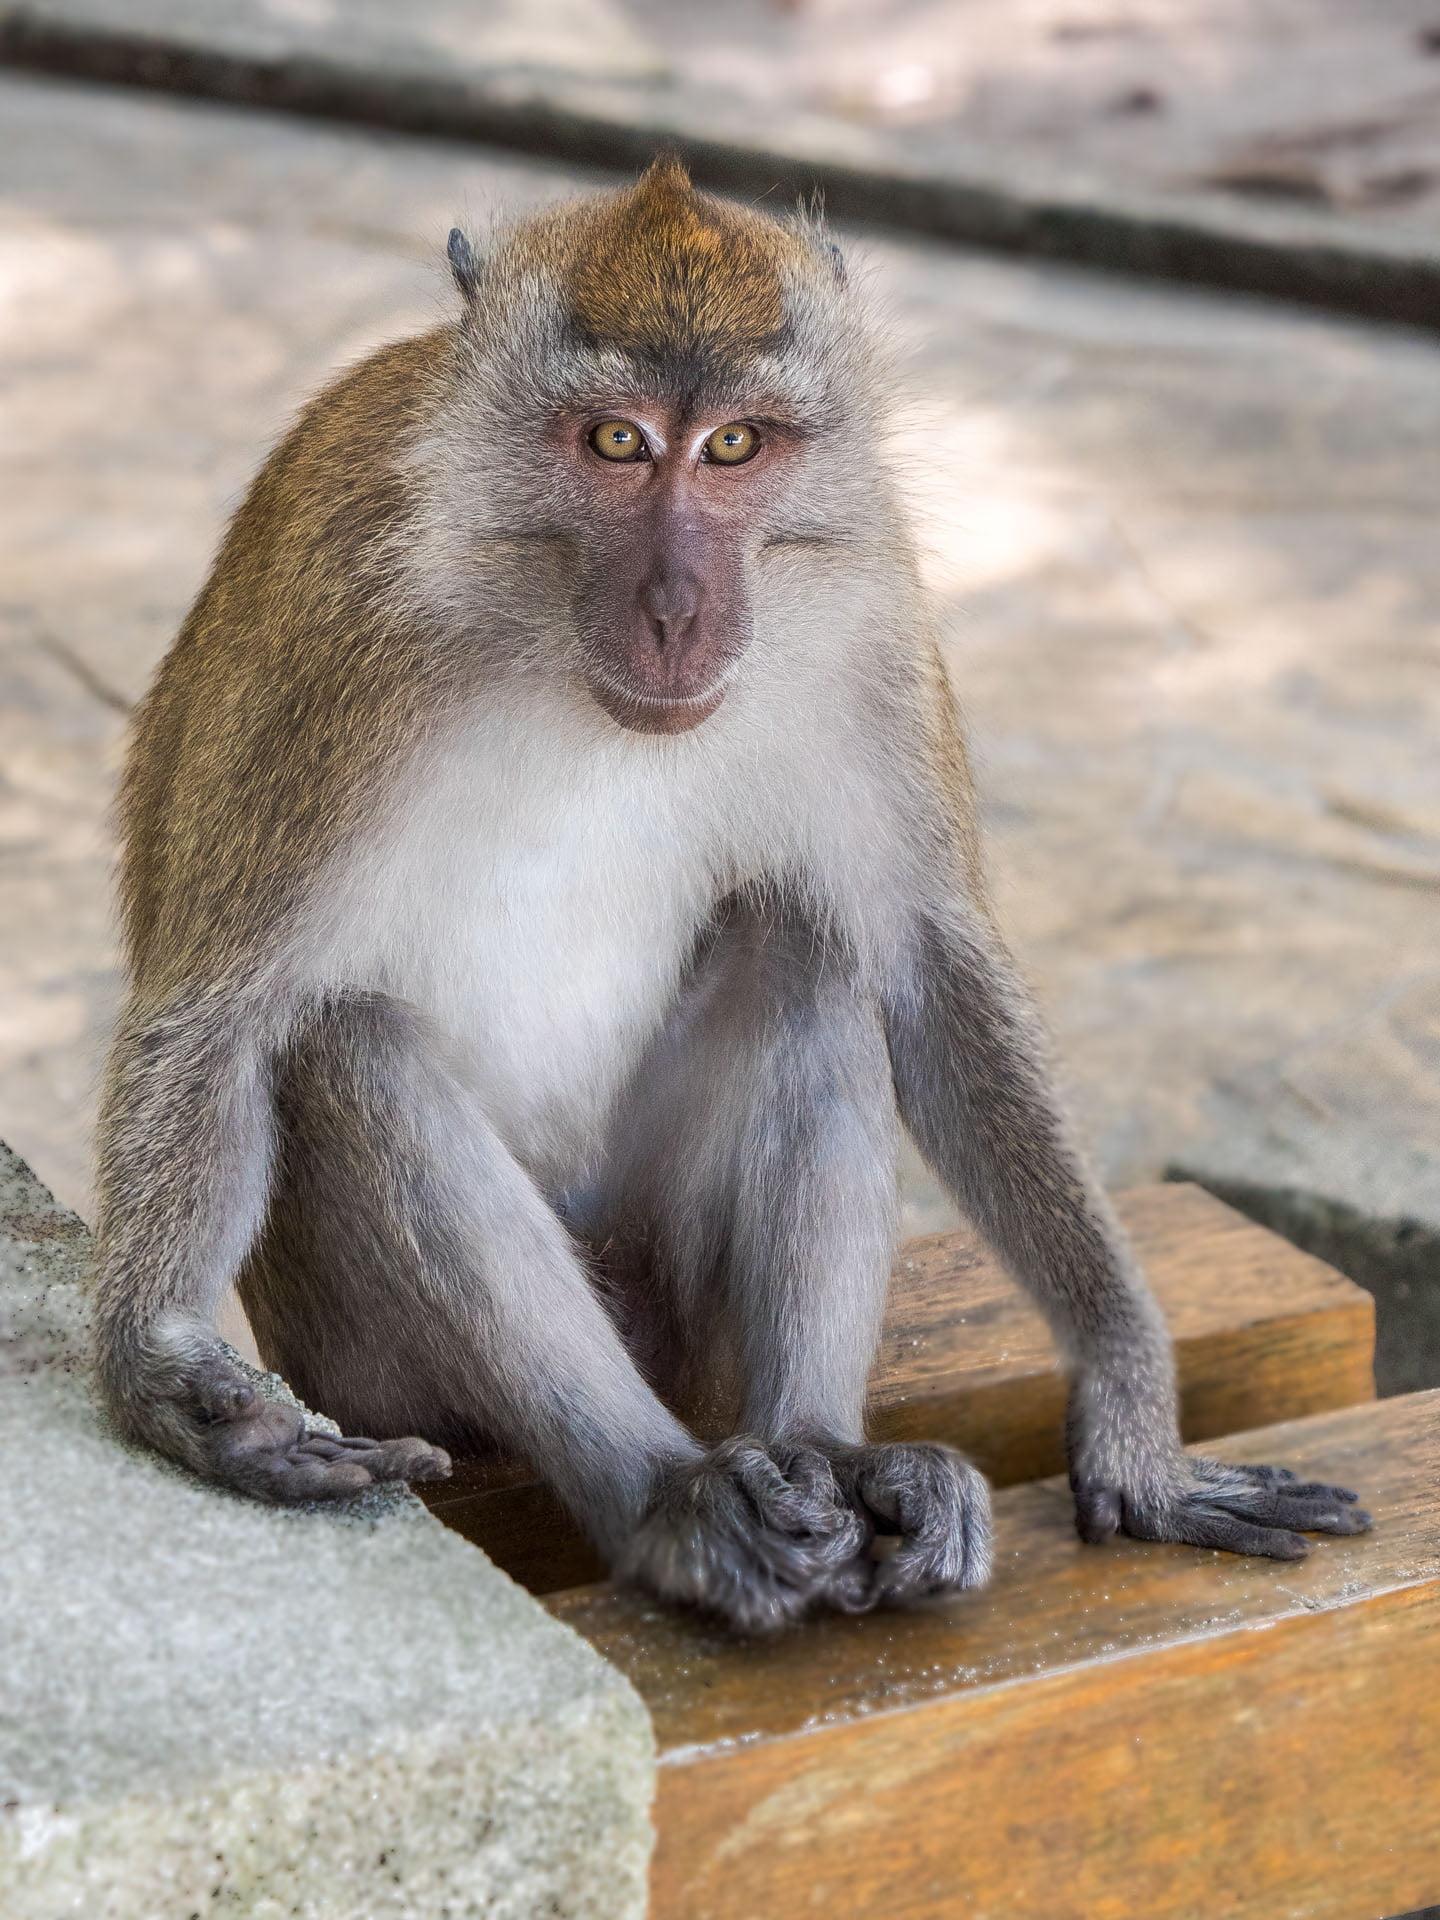 Penang macaque bis - Les globe blogueurs - blog voyage nature